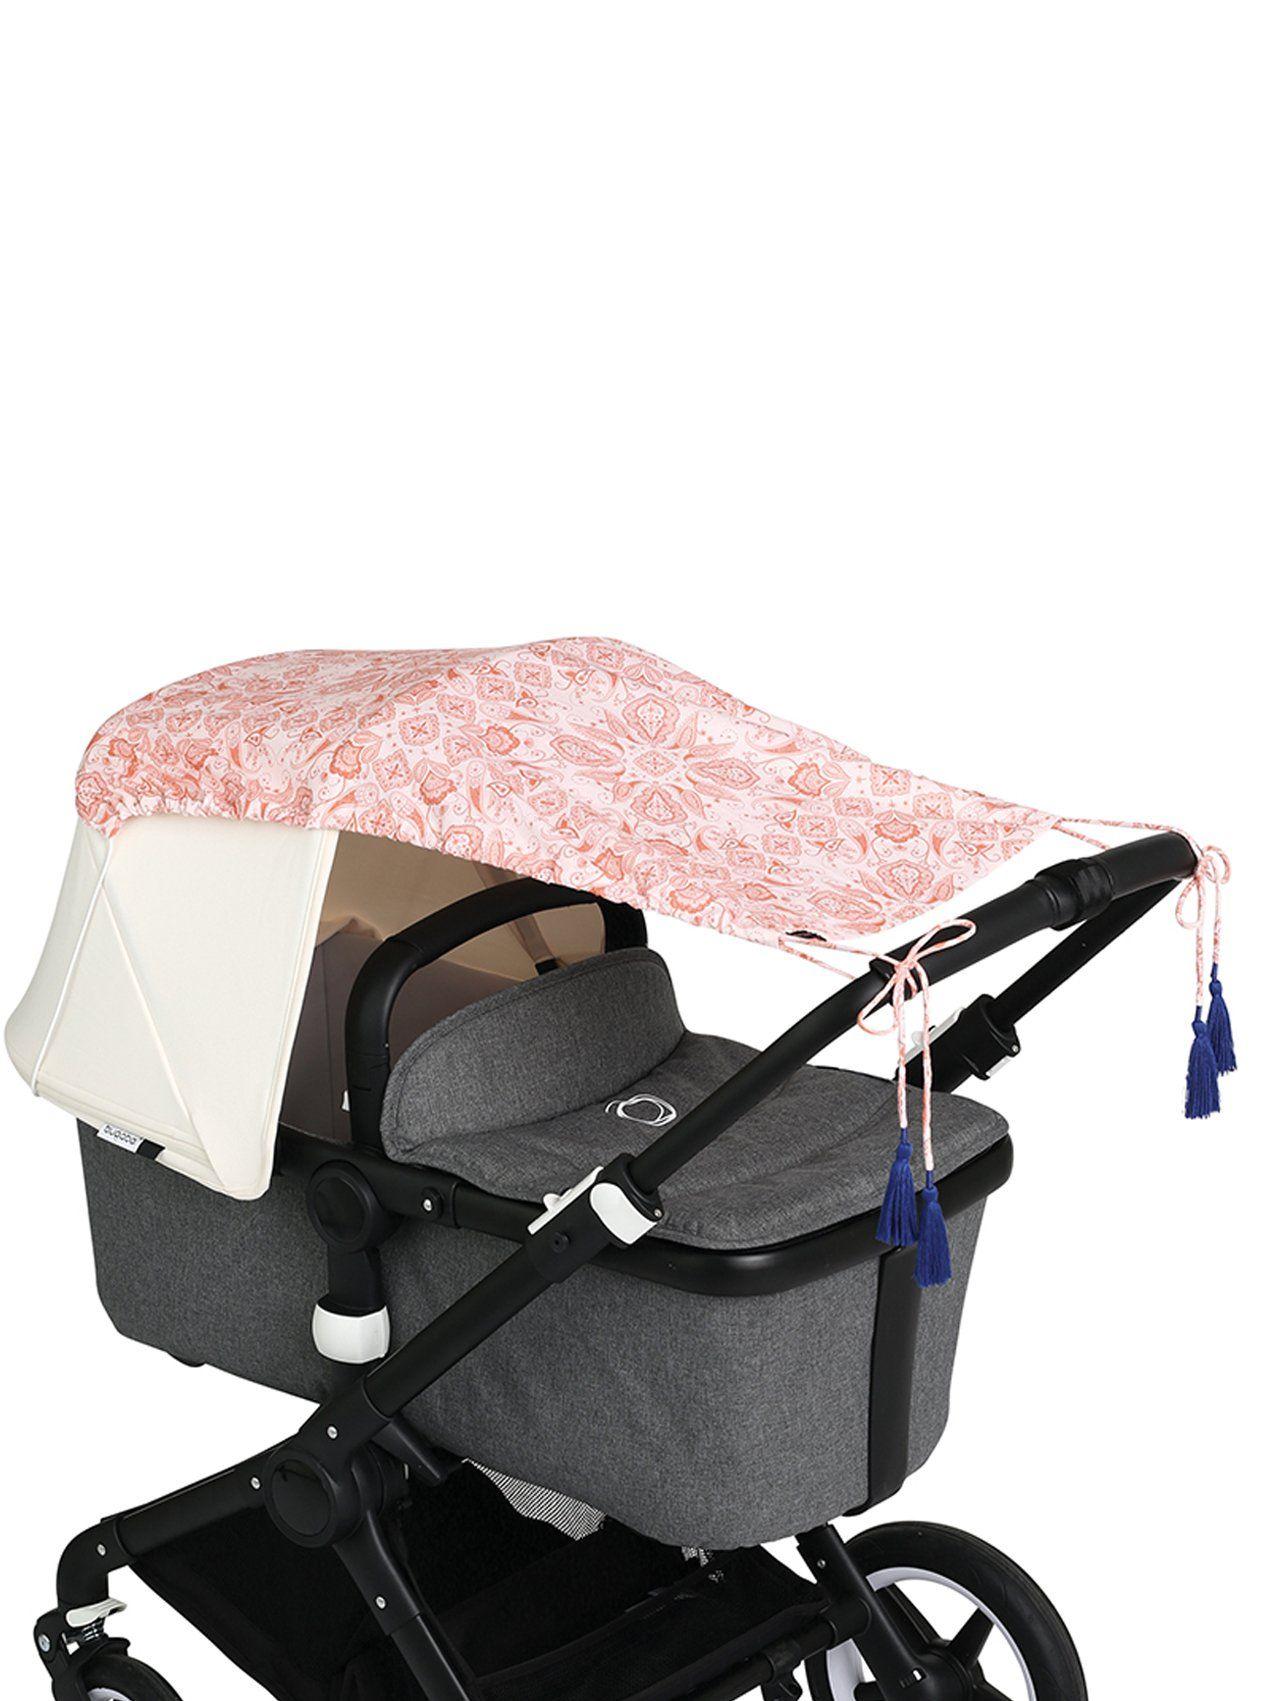 Sonnensegel Valley Of Flowers In Rosa In 2020 Sonnensegel Kinderwagen Kinder Wagen